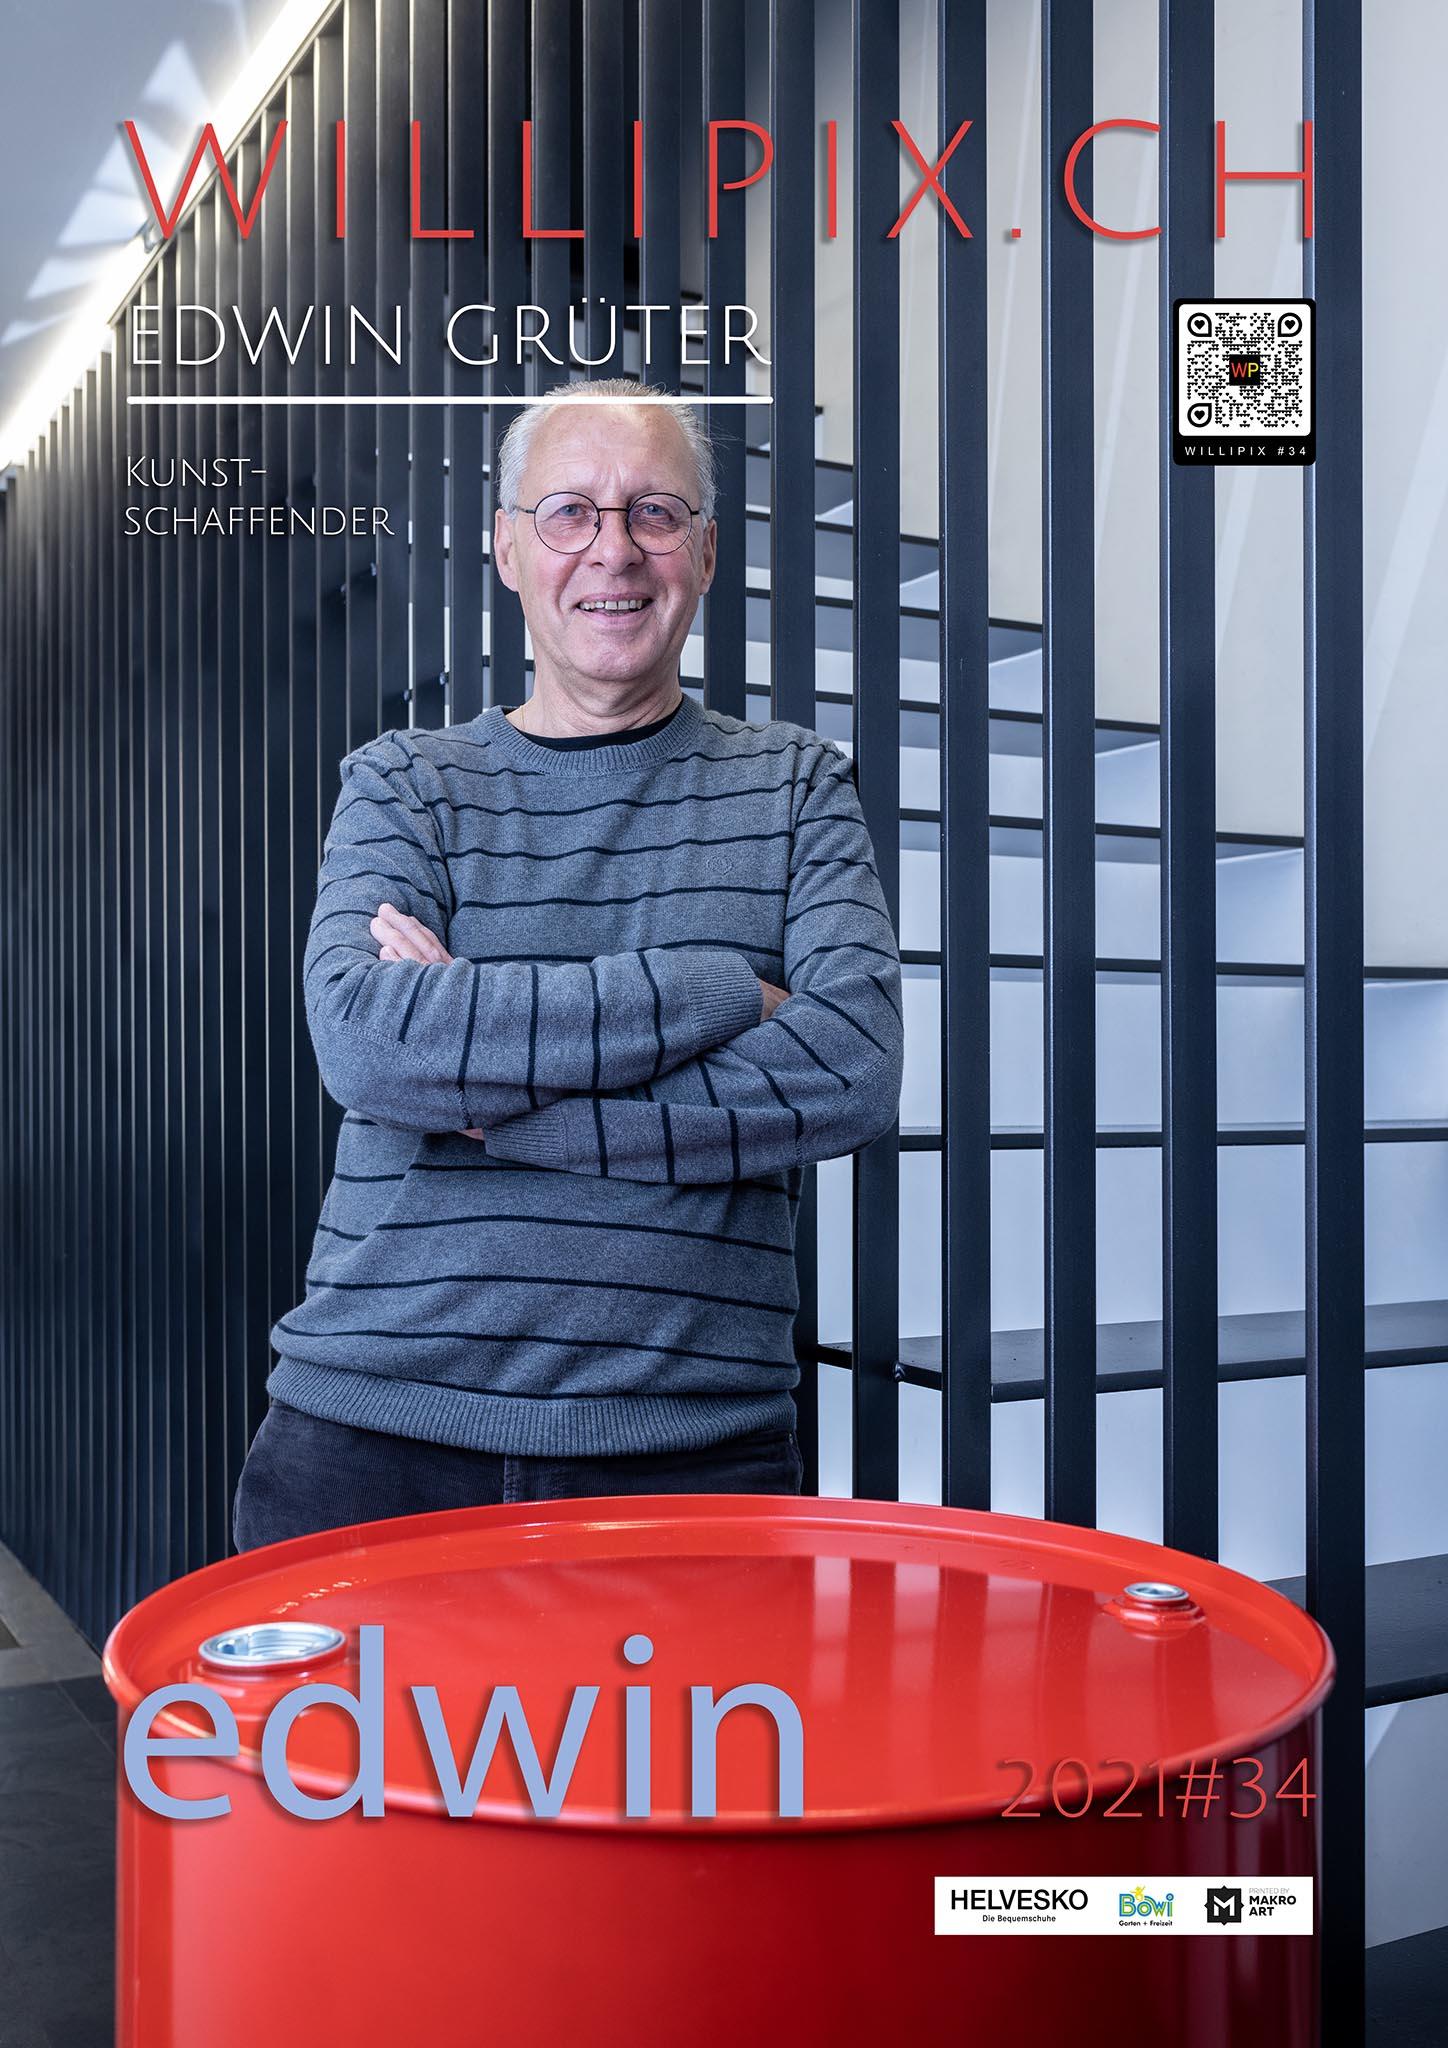 WILLIPIX-34: EDWIN GRUETER